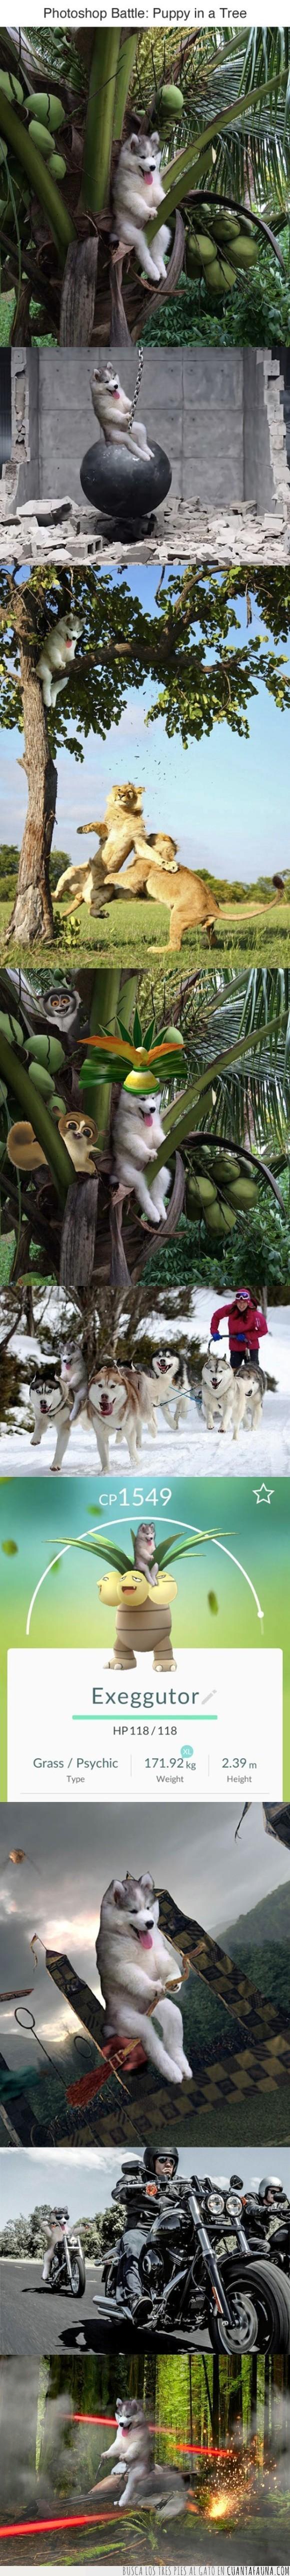 cachorro,chops,husky,perro